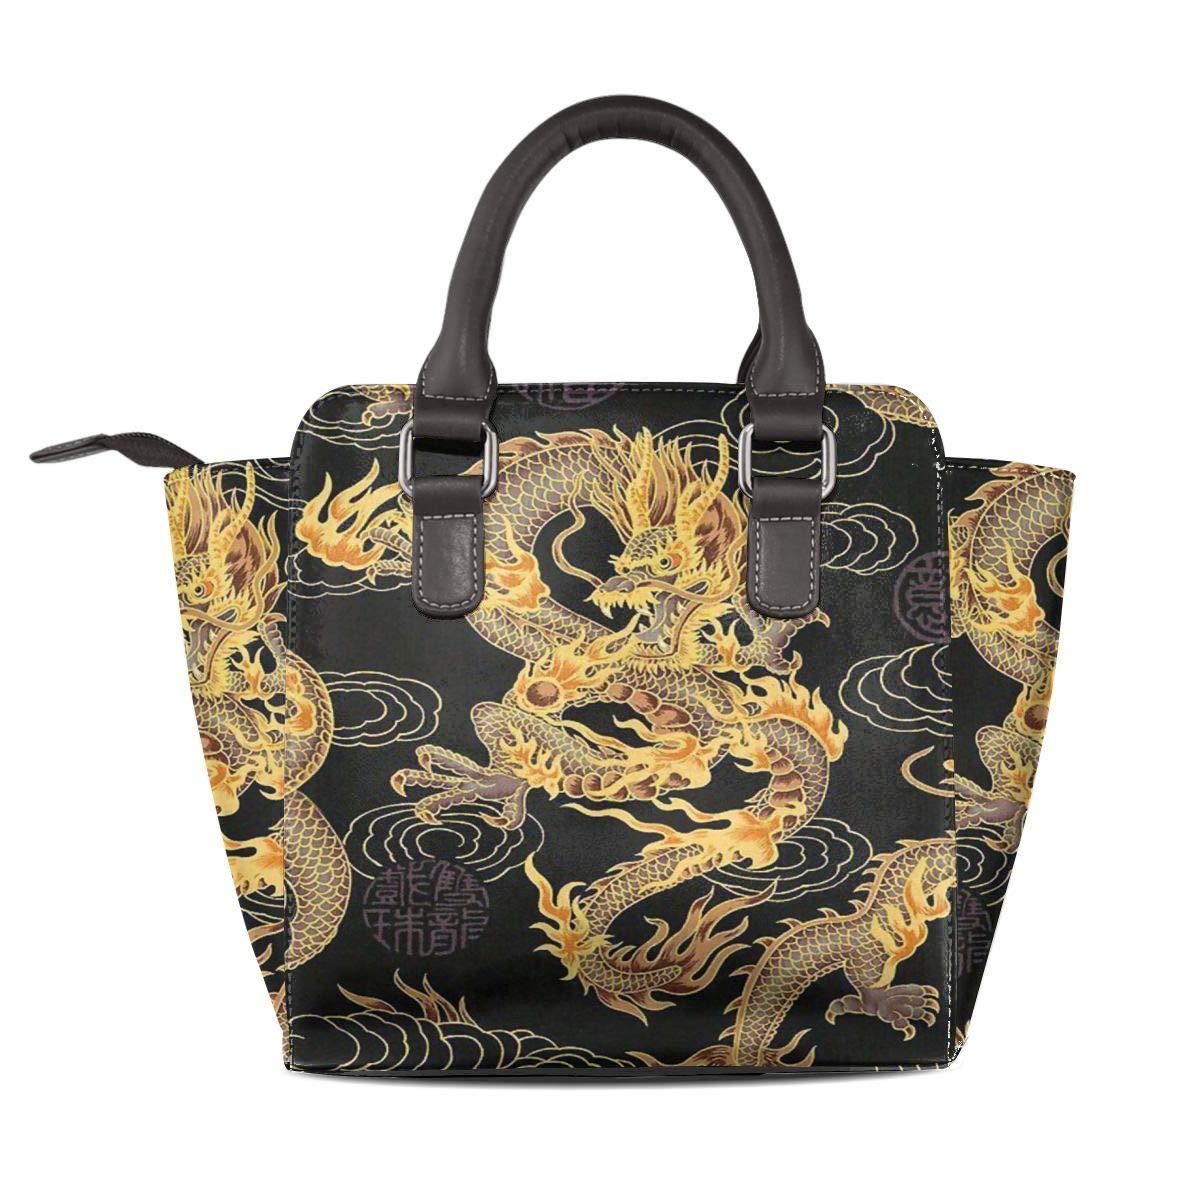 a429832b3302 Amazon.com: Tote Bag Chinese Dragon Golden And Black Handbags Large ...